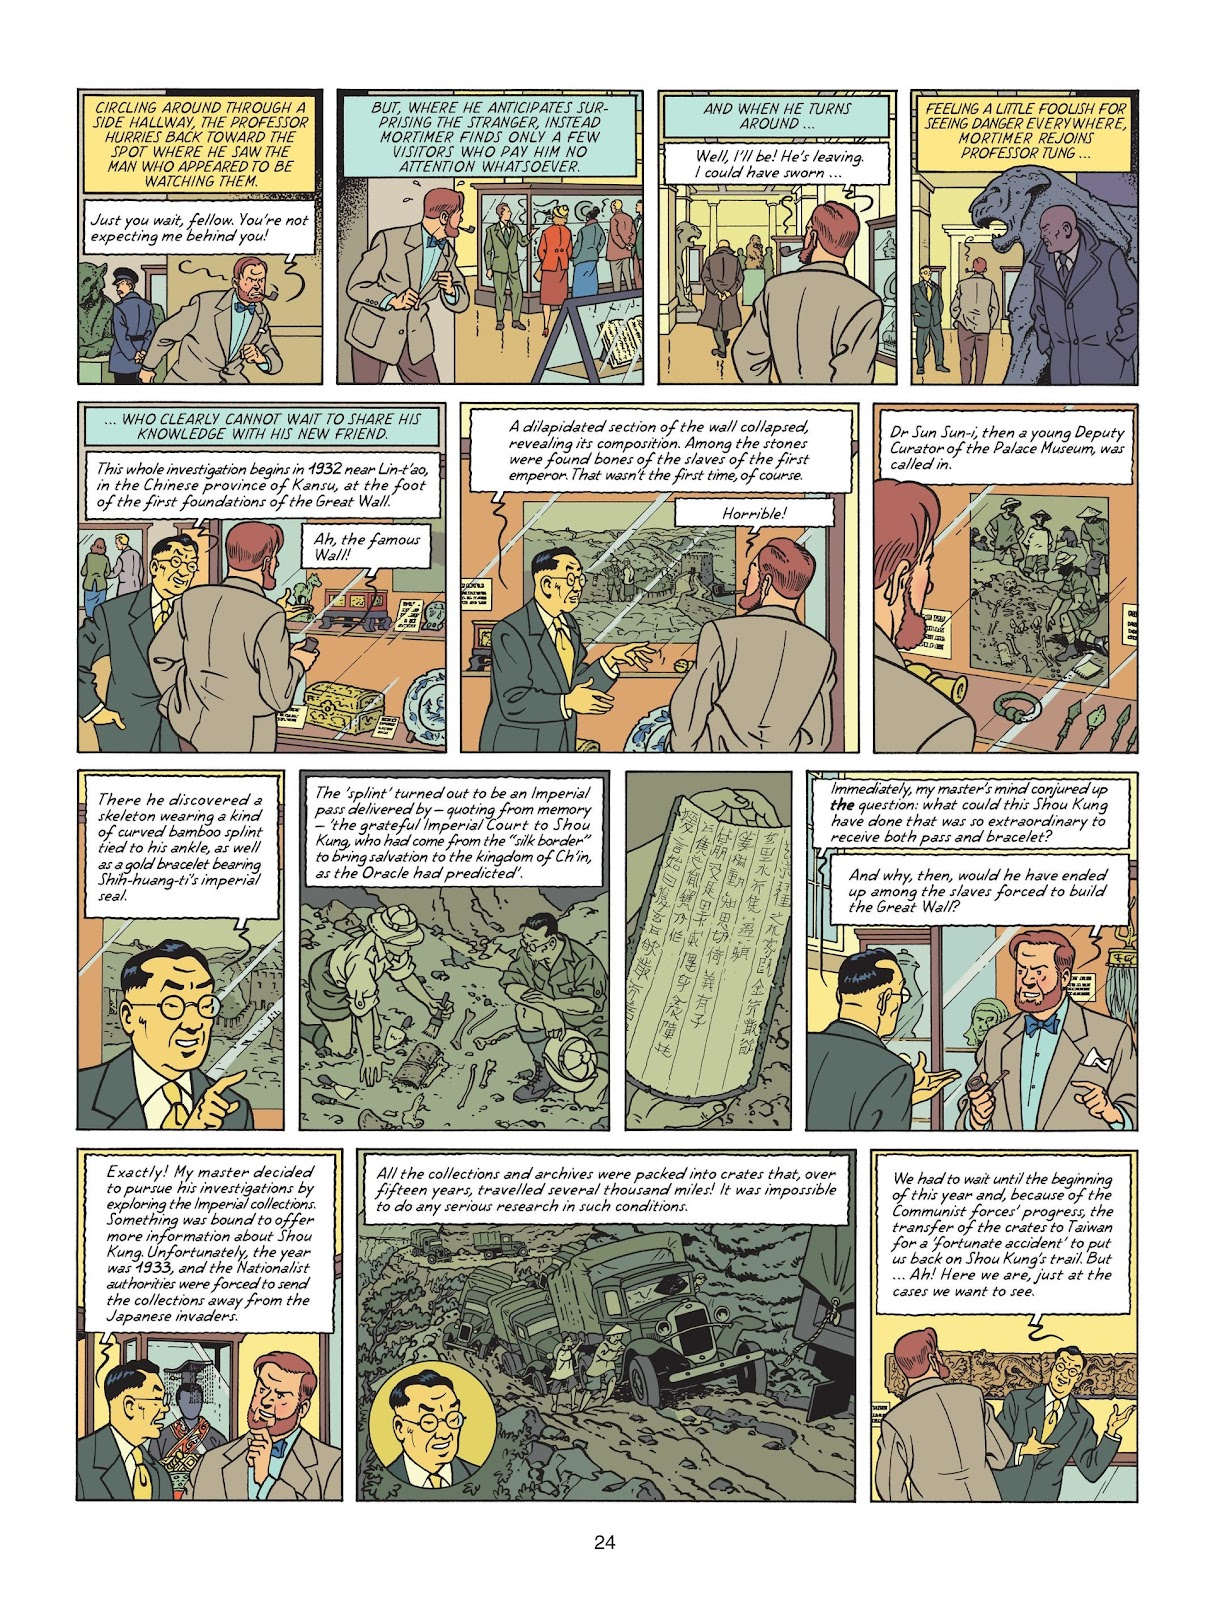 Read online Blake & Mortimer comic -  Issue #25 - 26